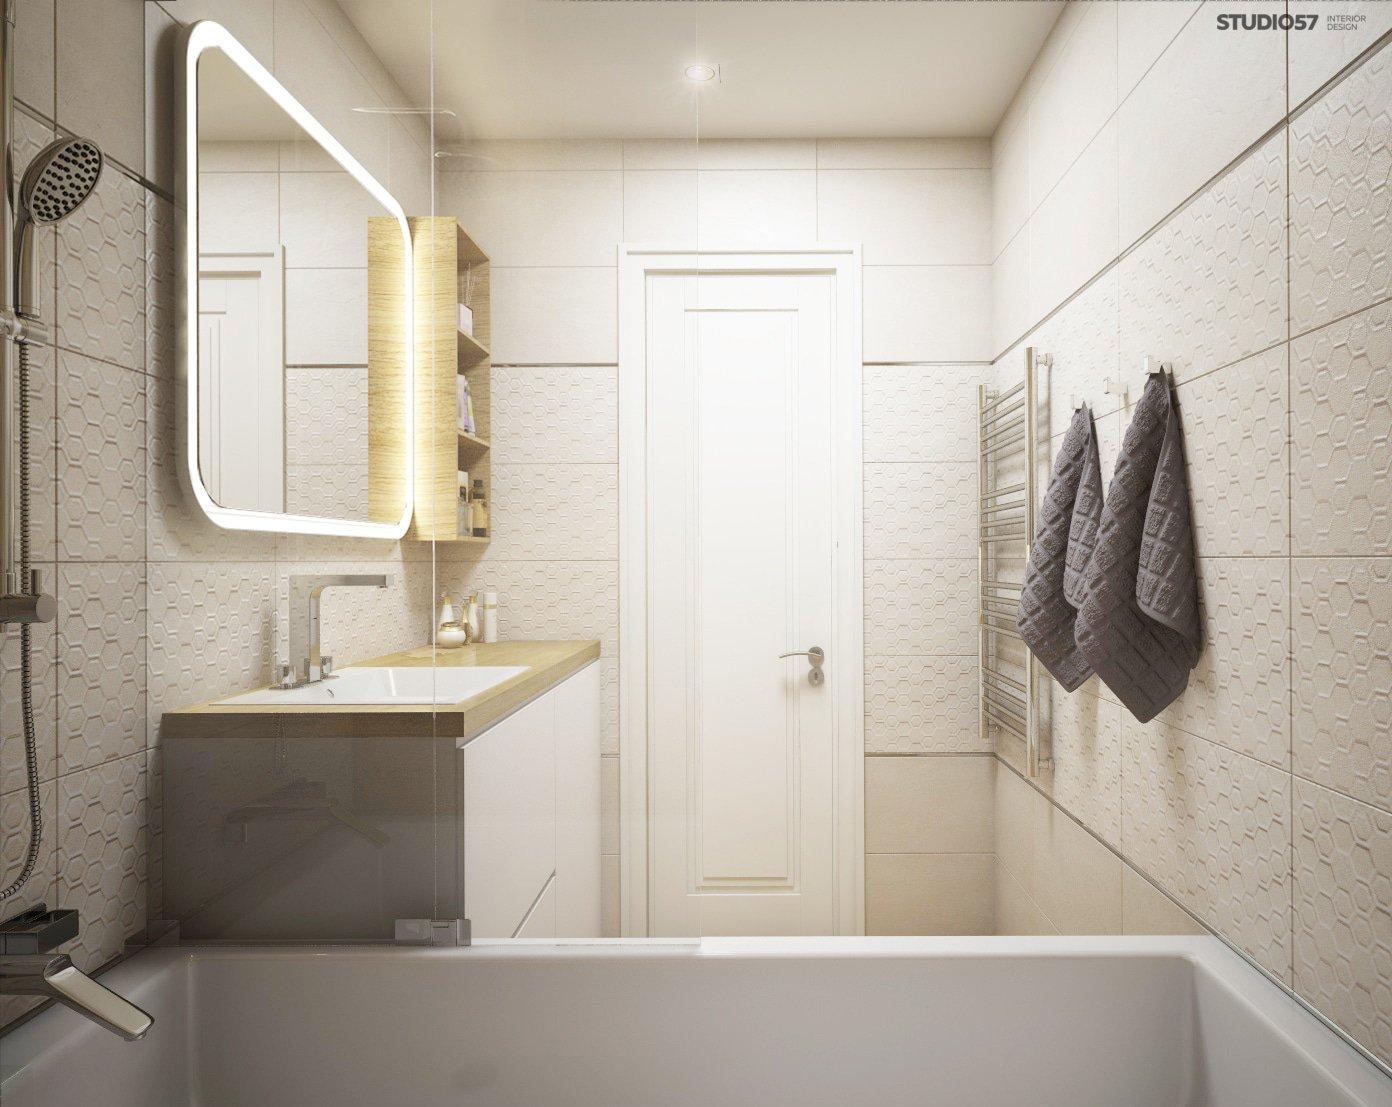 Bathroom photo in modern classic style